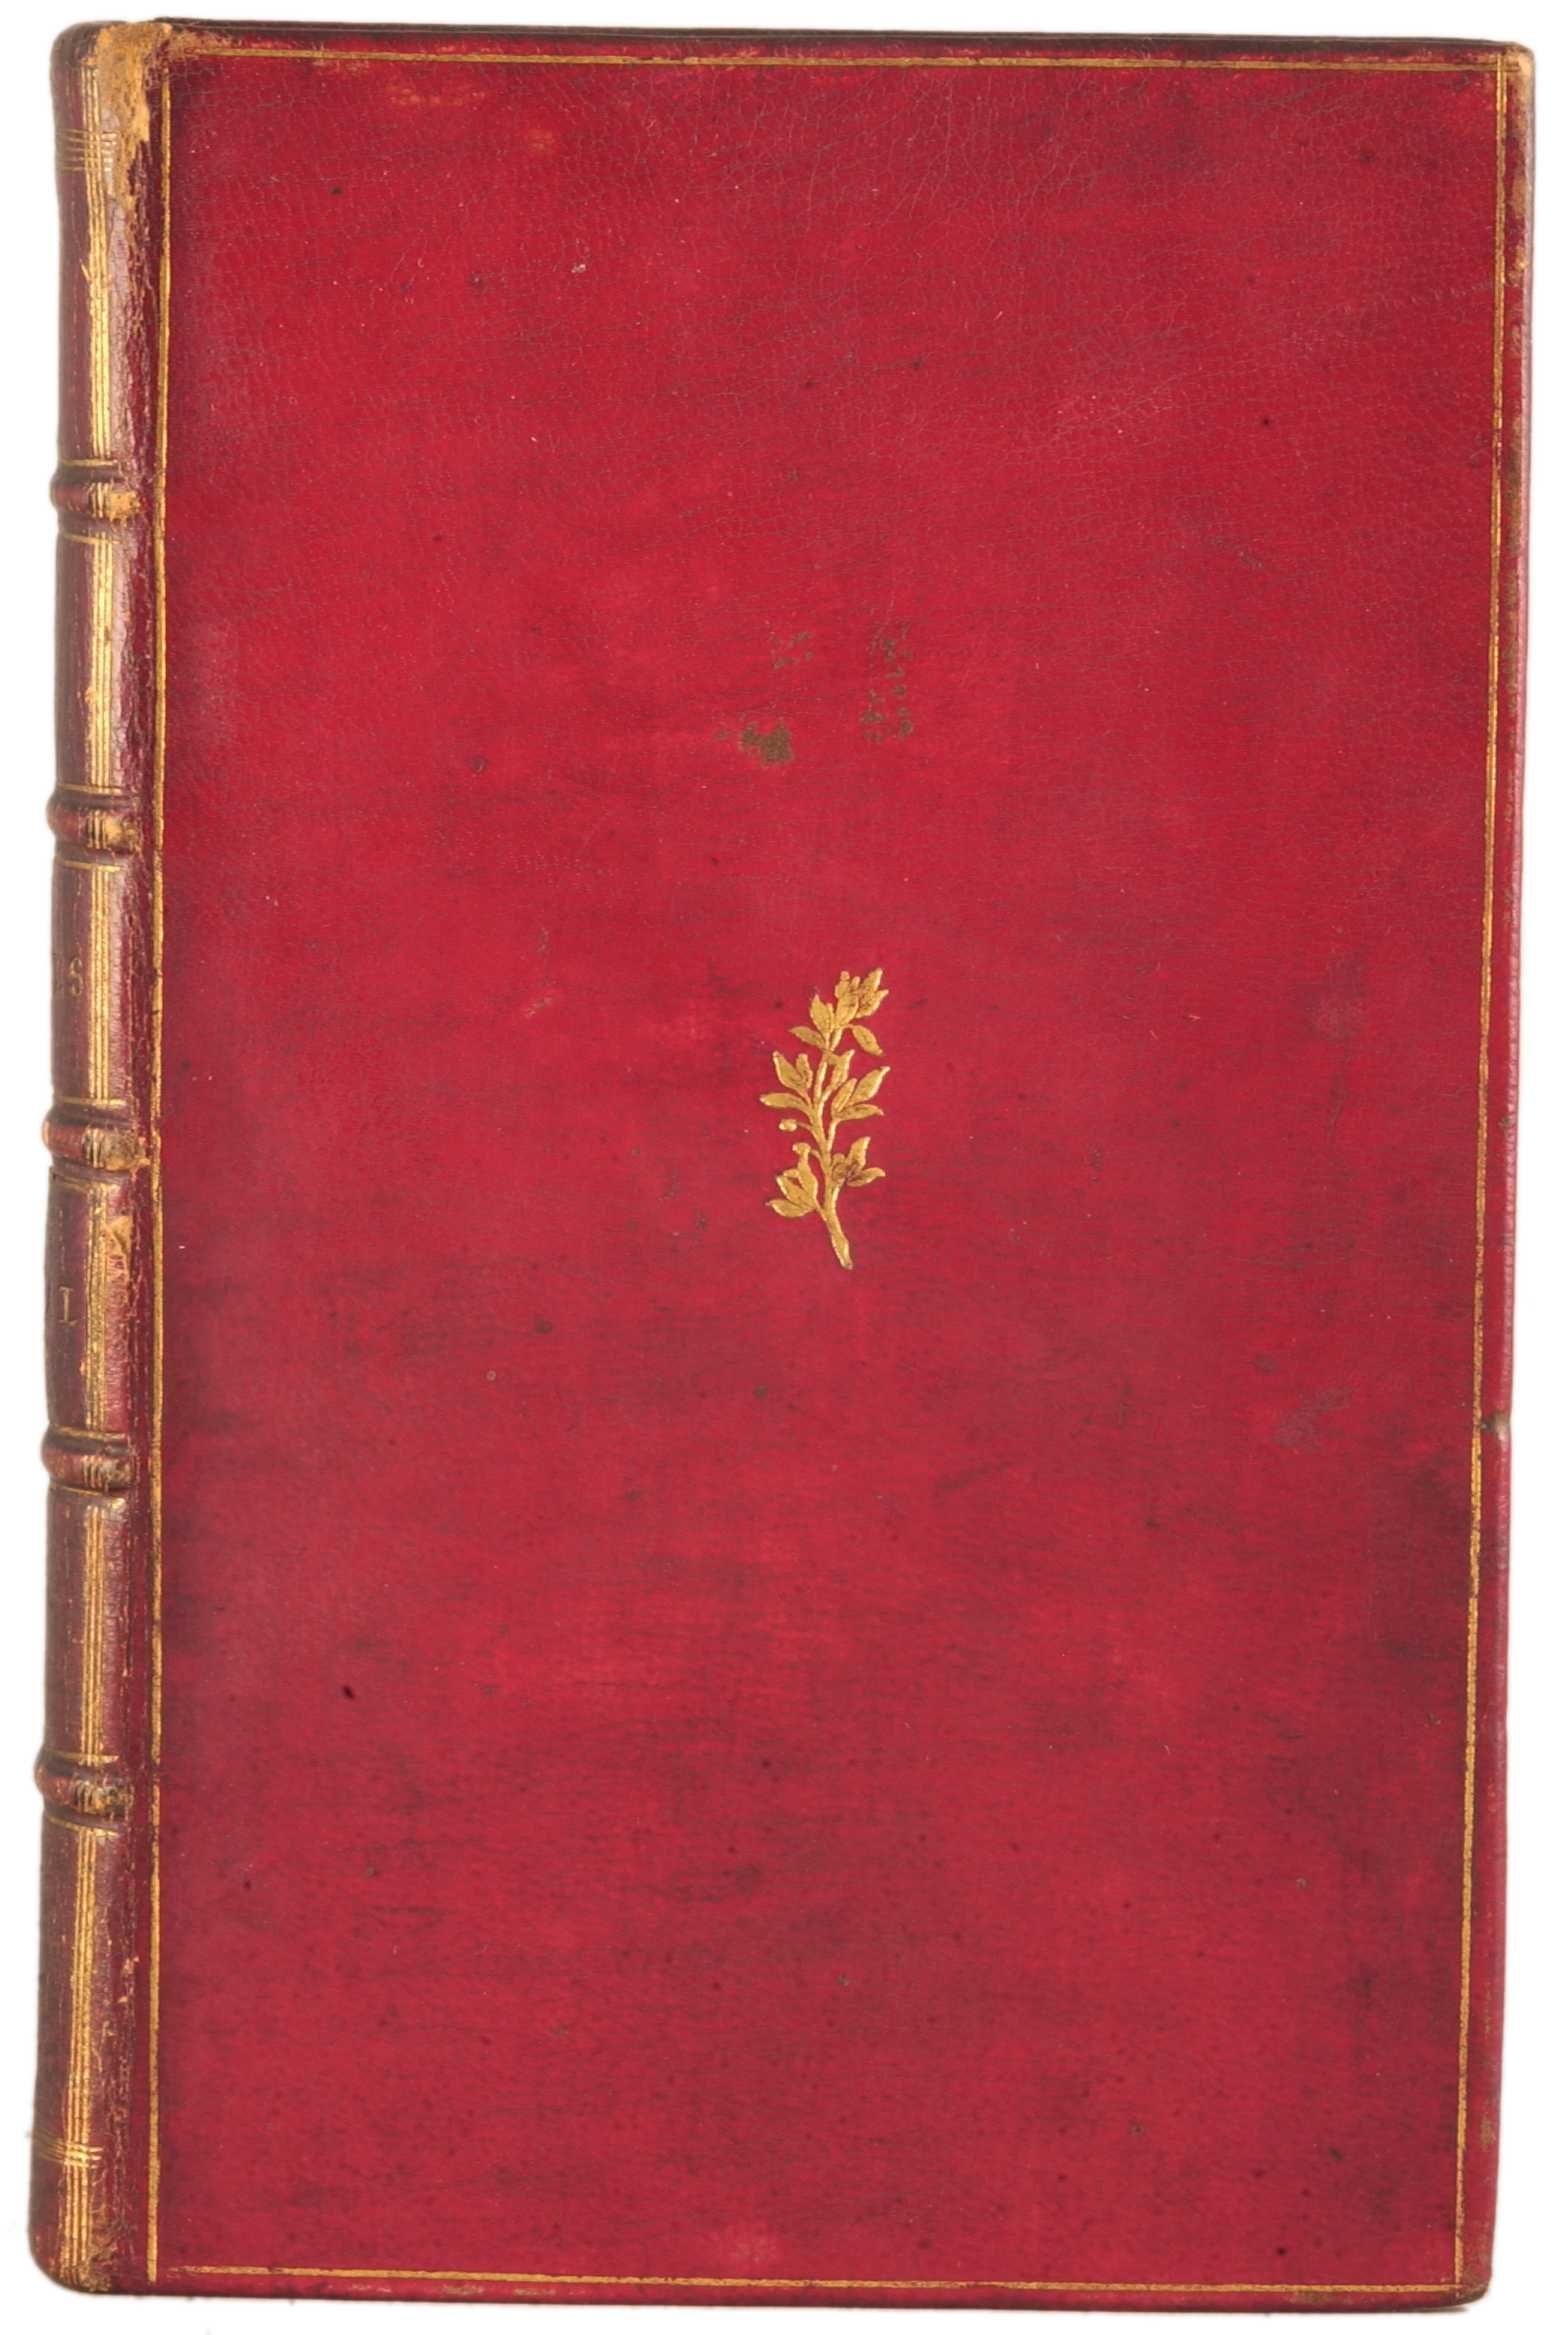 Author:Blackburne, Francis, 1705-1787 Title:The confessional. Published:London: Printed for S. Bladon, 1766..1.large.jpg (1554×2335)